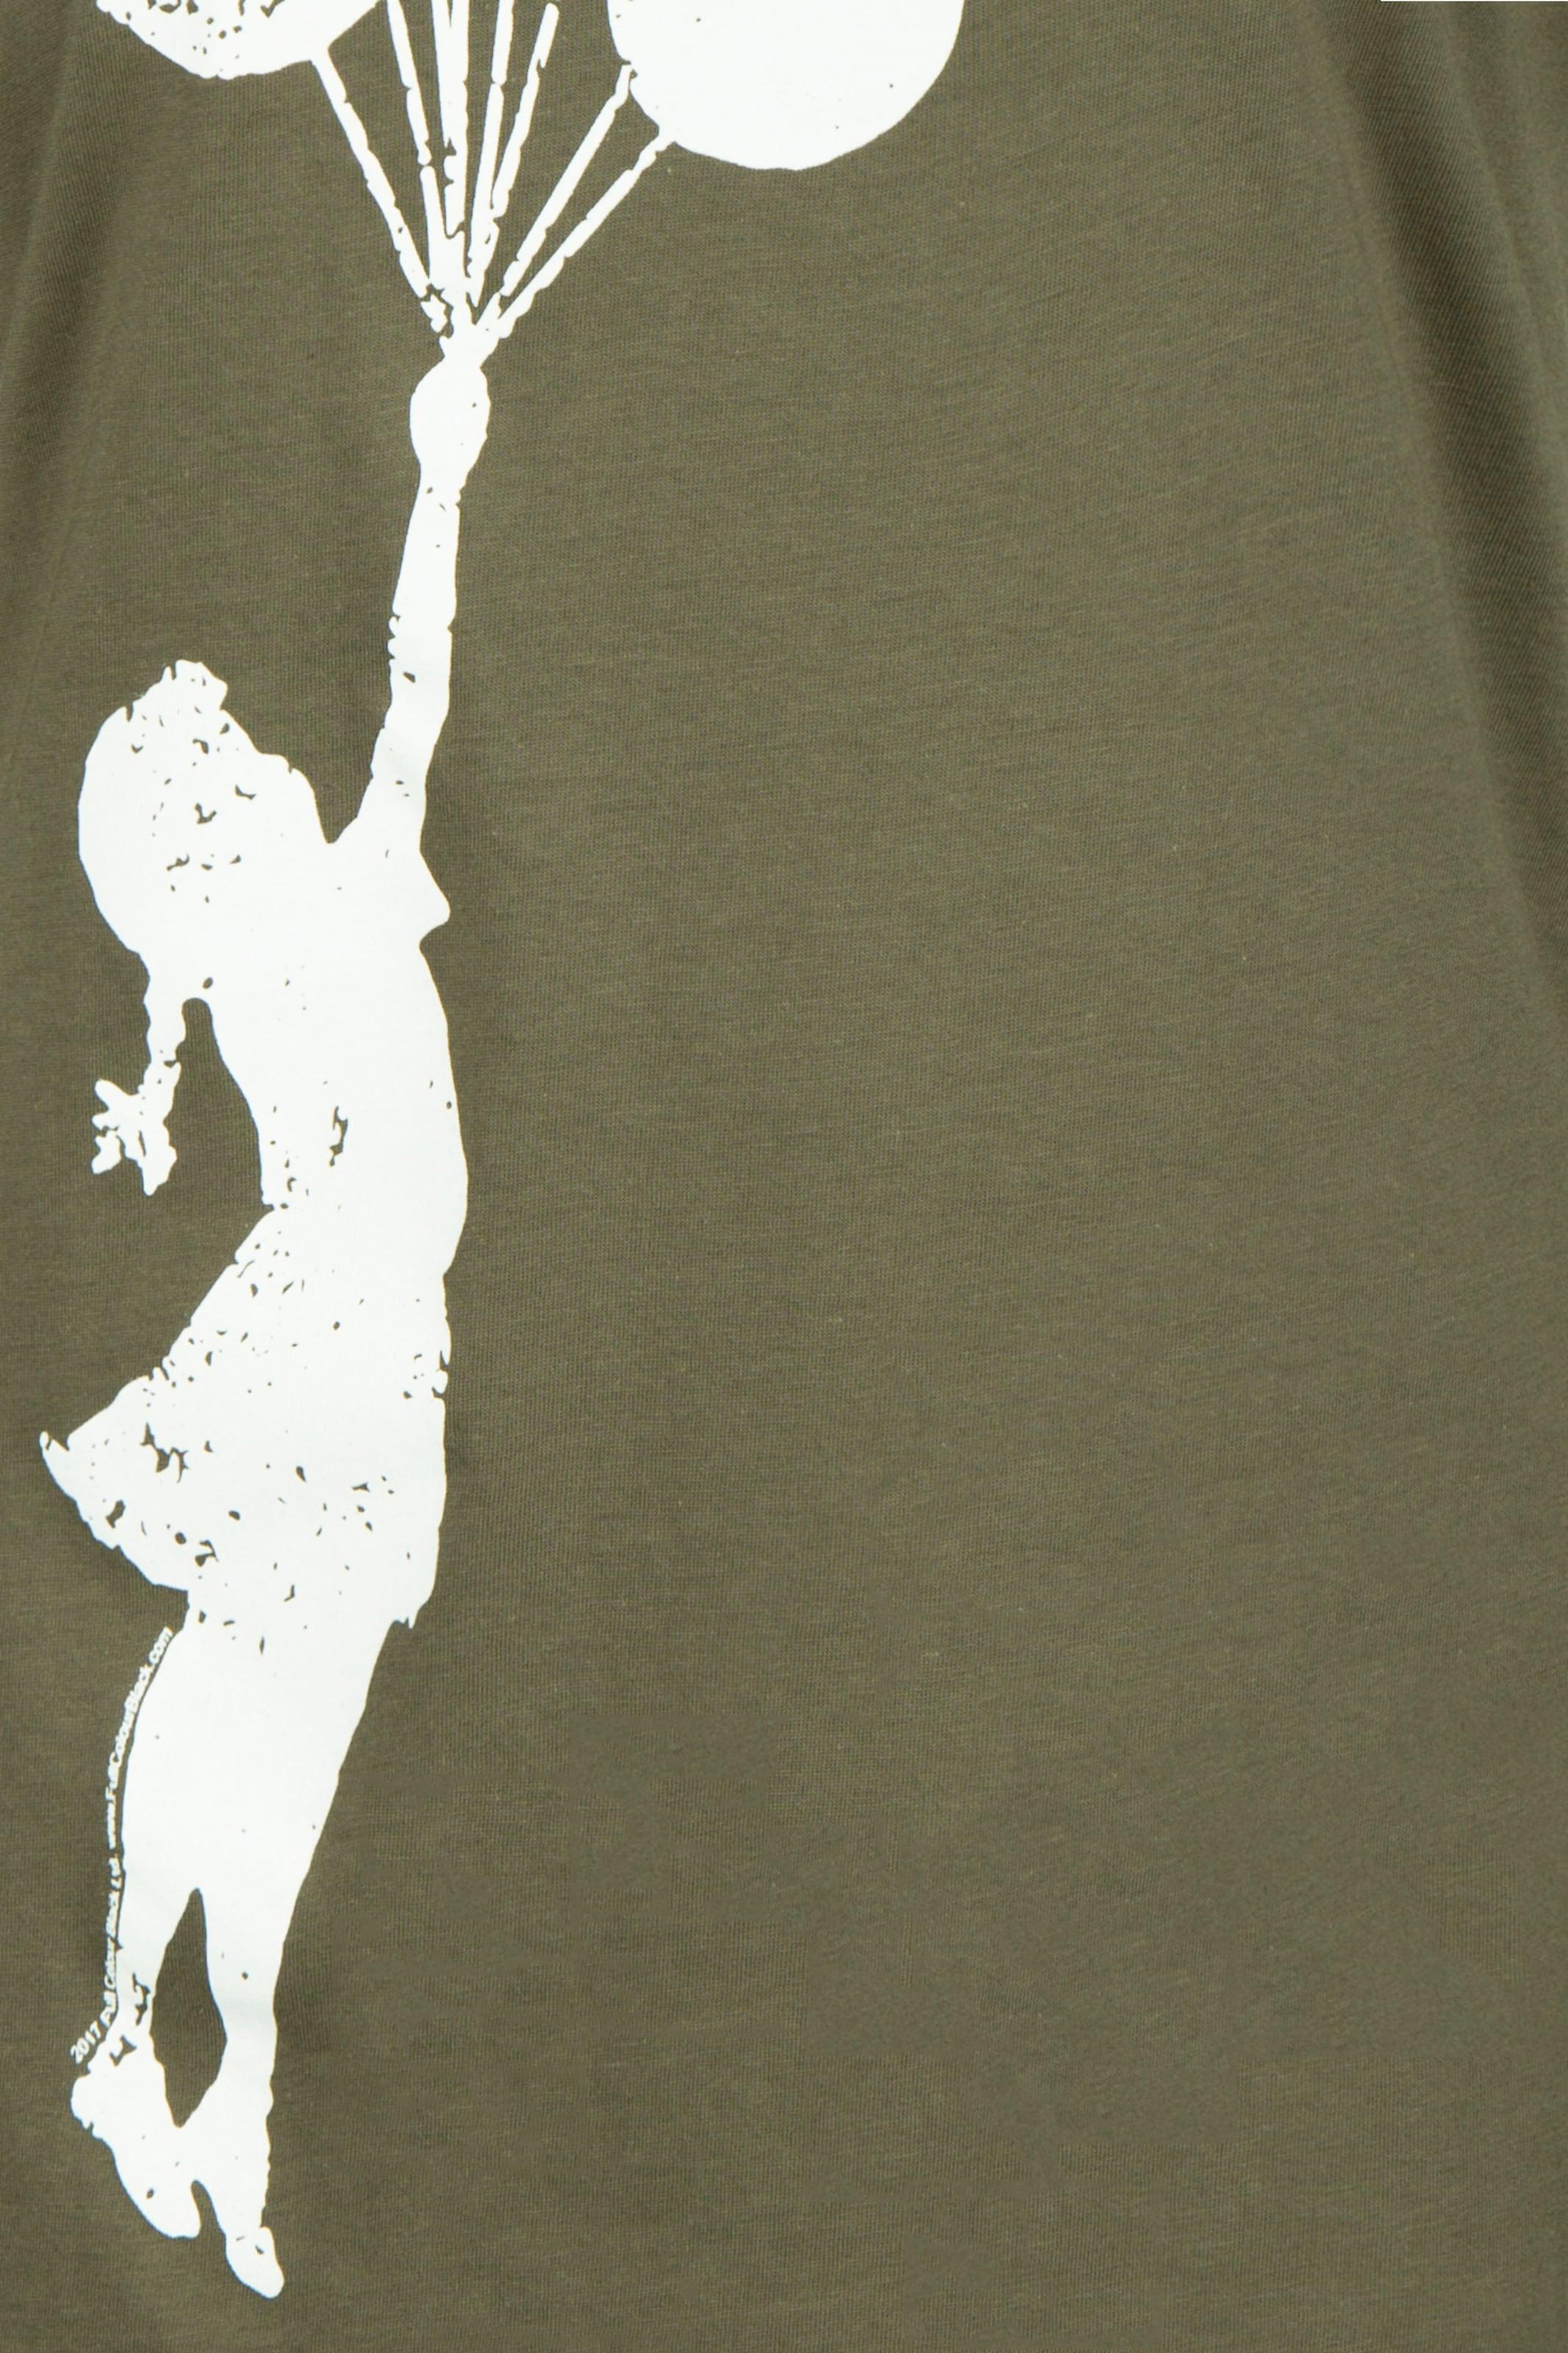 En shirt T Homebase BleuMarine 'brandalised Homebase' By Foncé kPnX8w0O